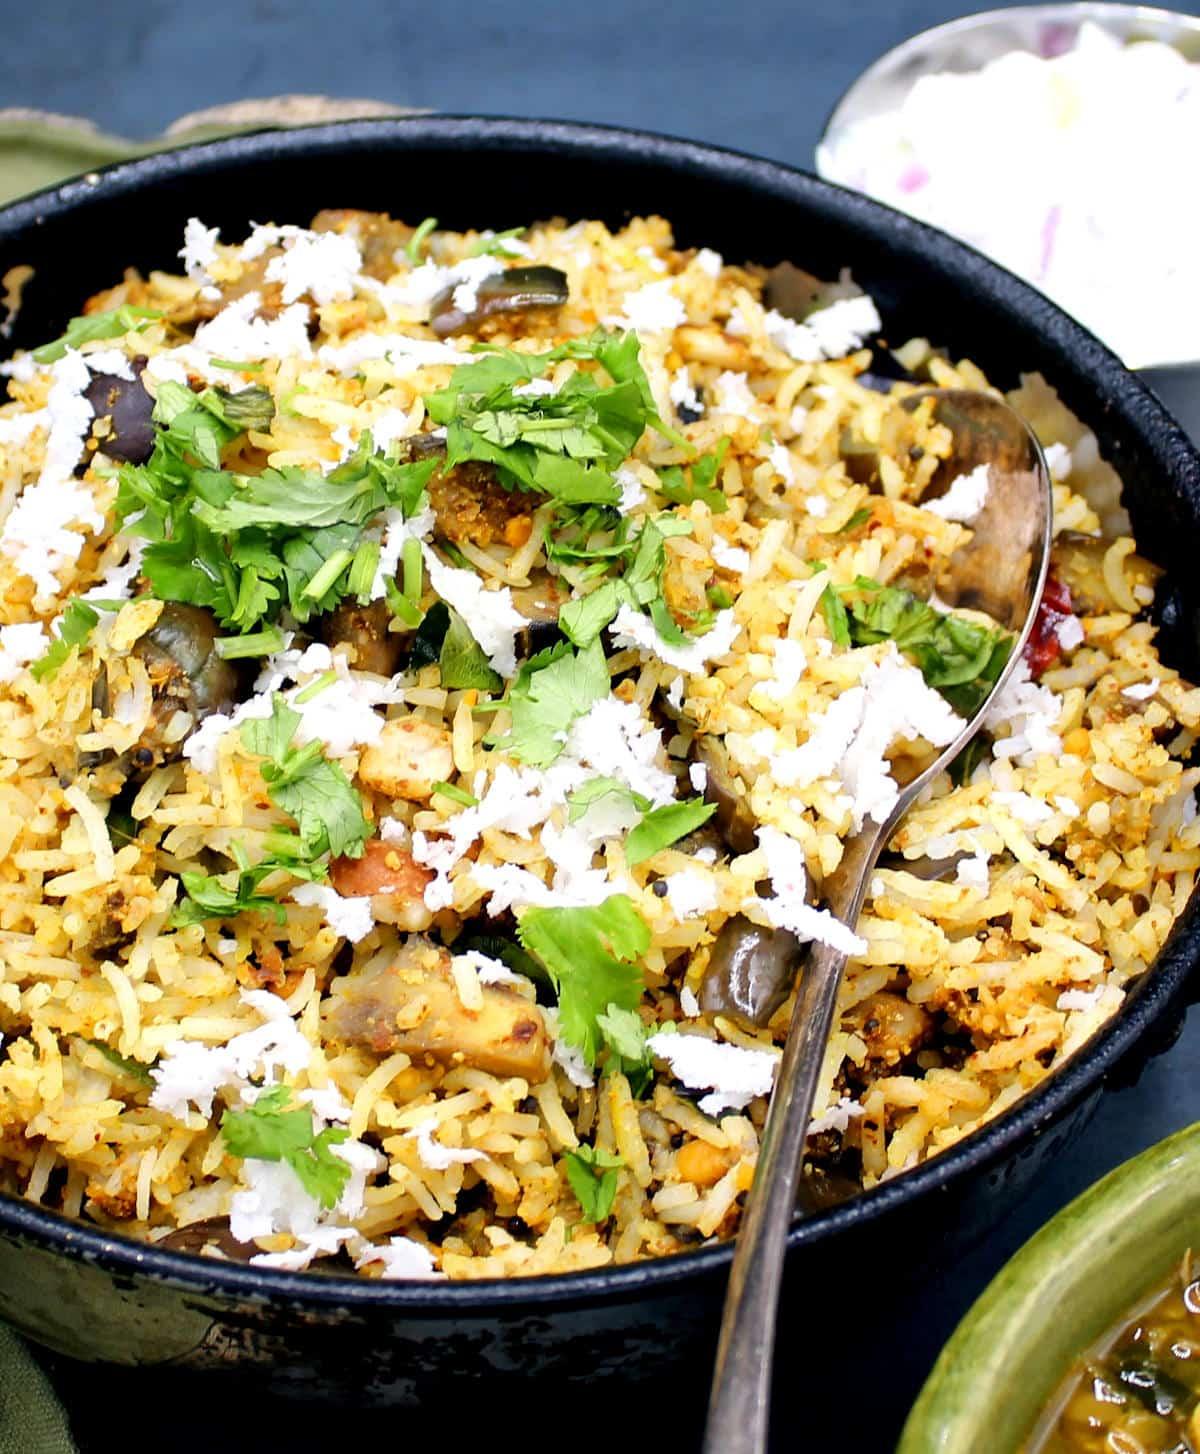 Closeup photo of vangi bath or Tamil eggplant rice.